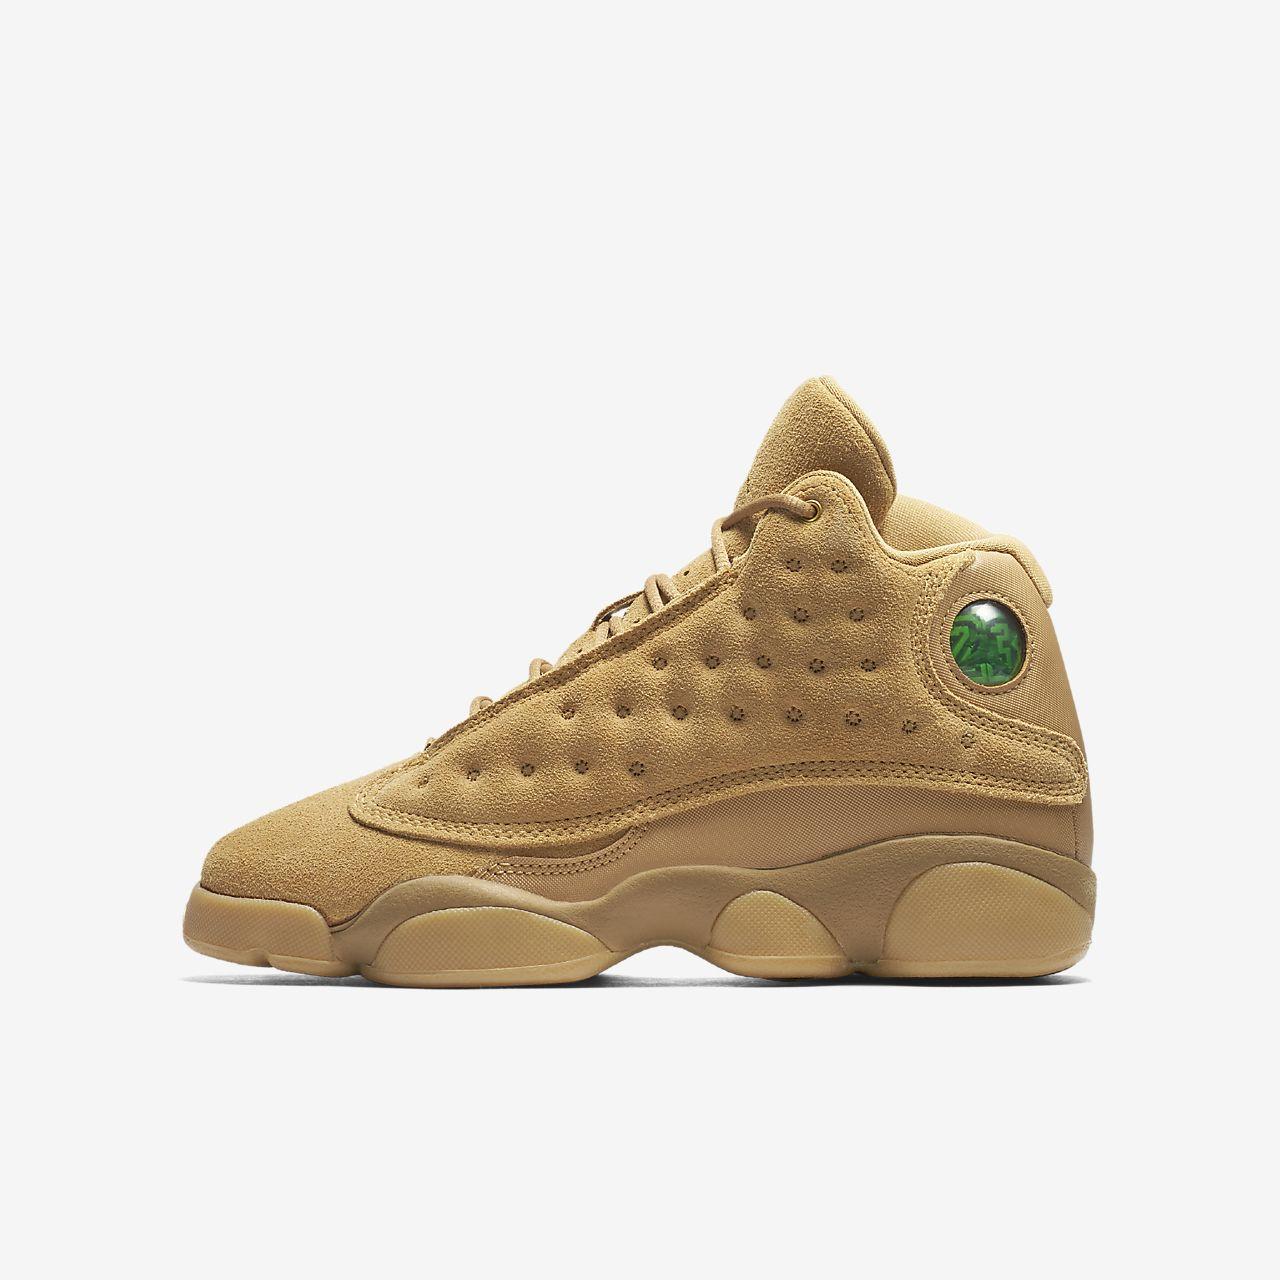 online store dbd1c 3b57d ... nike air huarache run pa zapatillas hombre blanco marrón claro goma  blanco australia air jordan 13 retro zapatillas niño a 63891 a1f76 ...